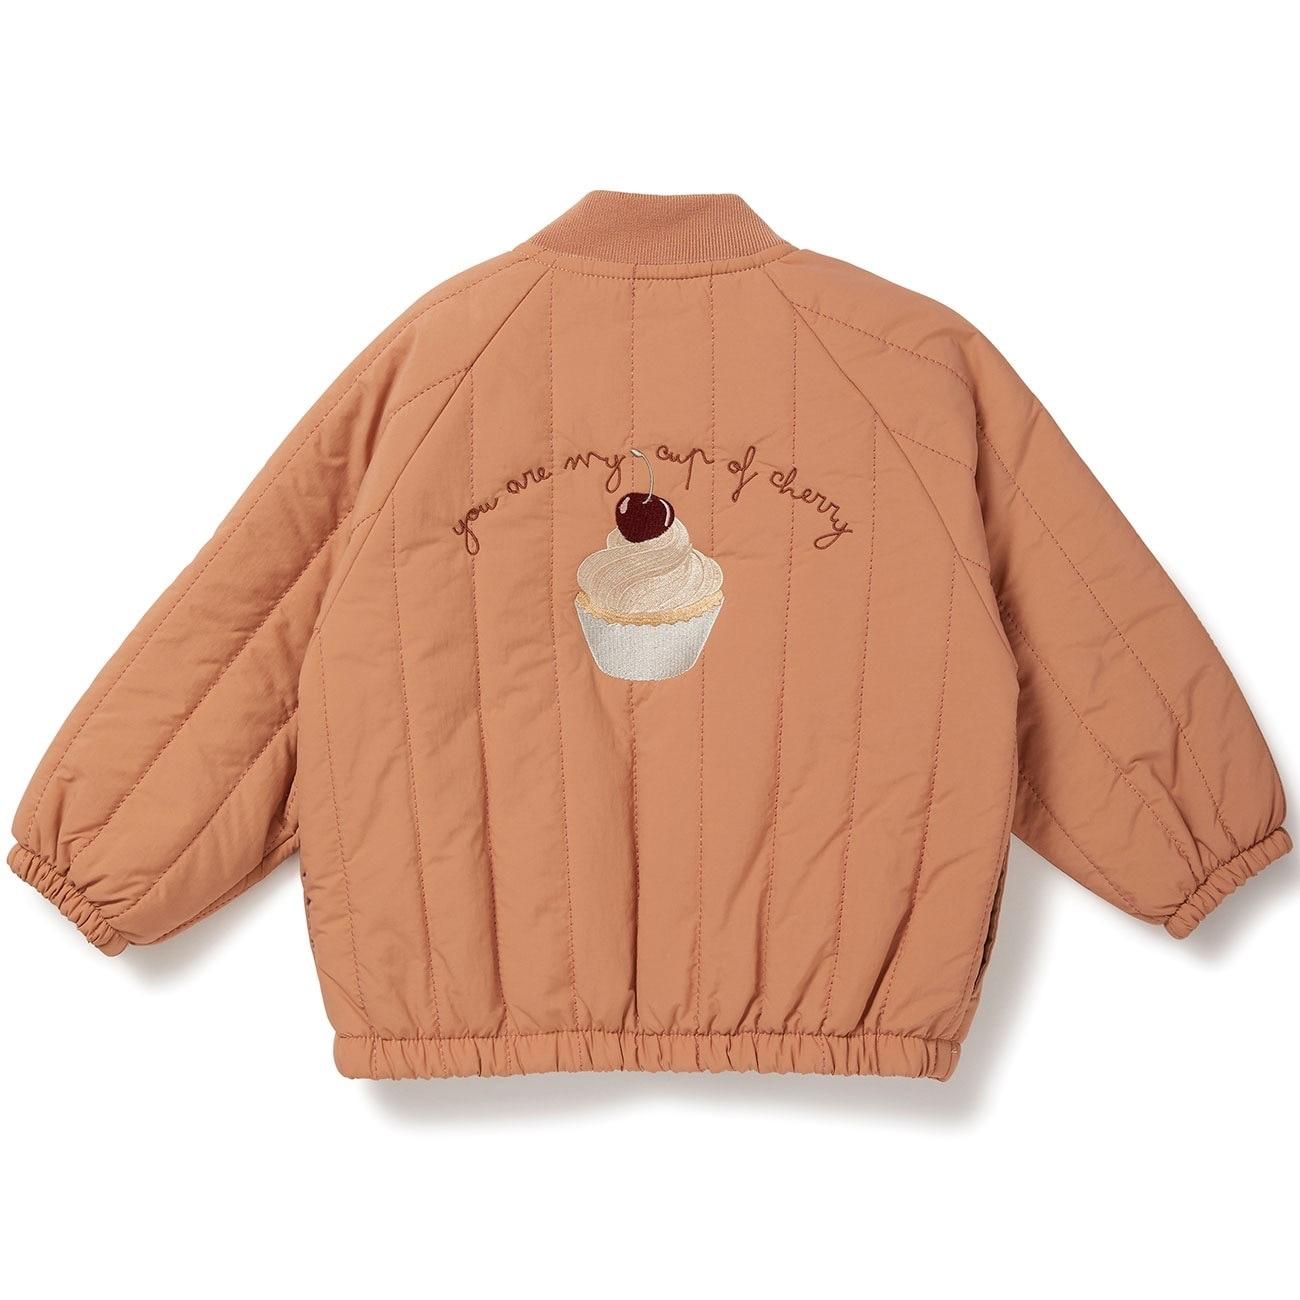 2021 New Winter KS Brand Baby Girls Cotton Jacket for Boys Cute Print Warm Coat Kids Toddler Fashion